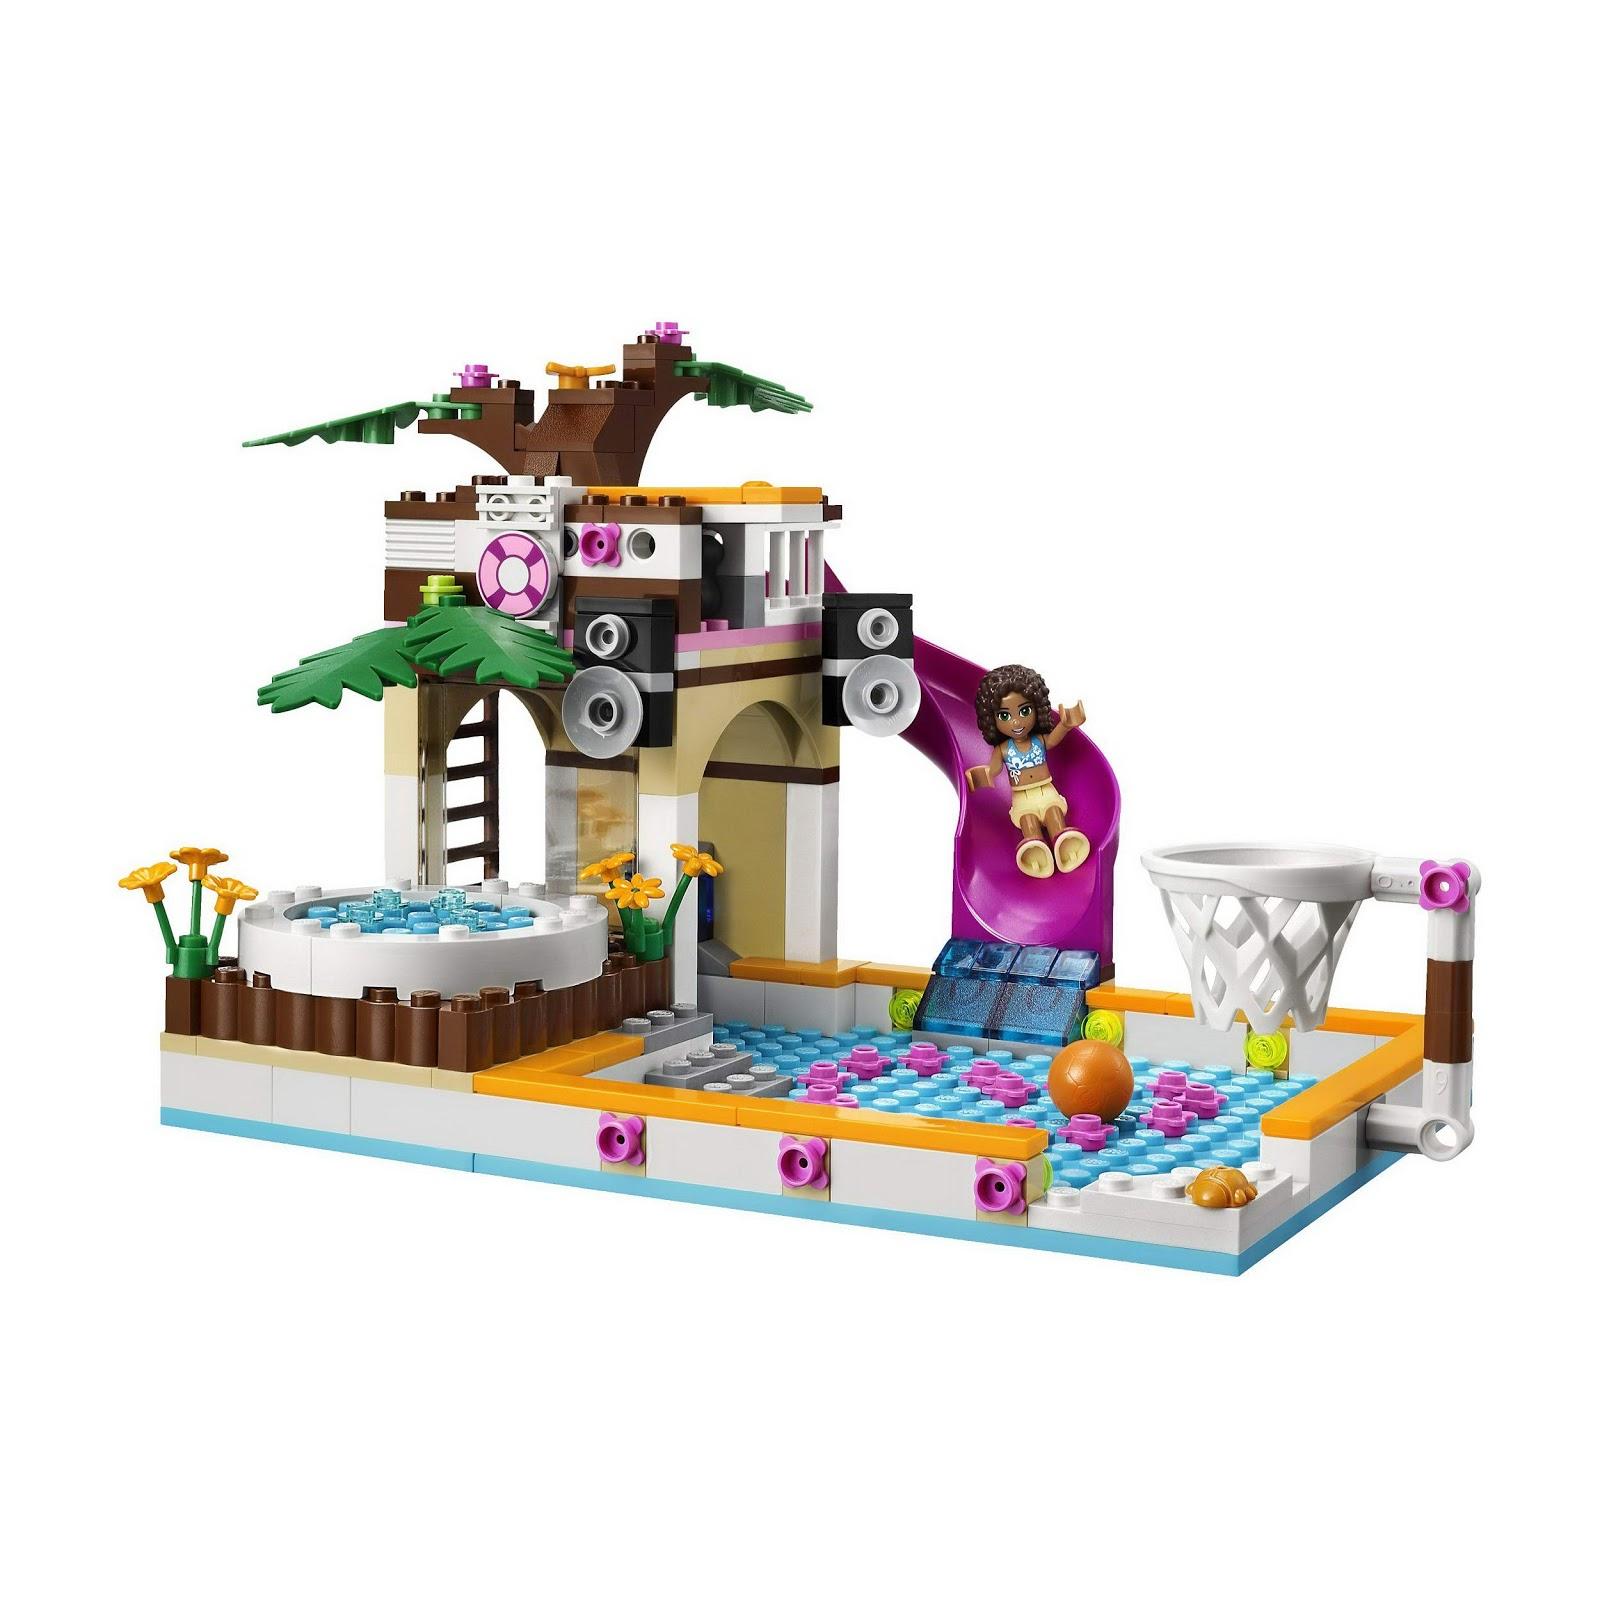 Lego Friends Pool Lego Heartlake City Pool Instructions 41008